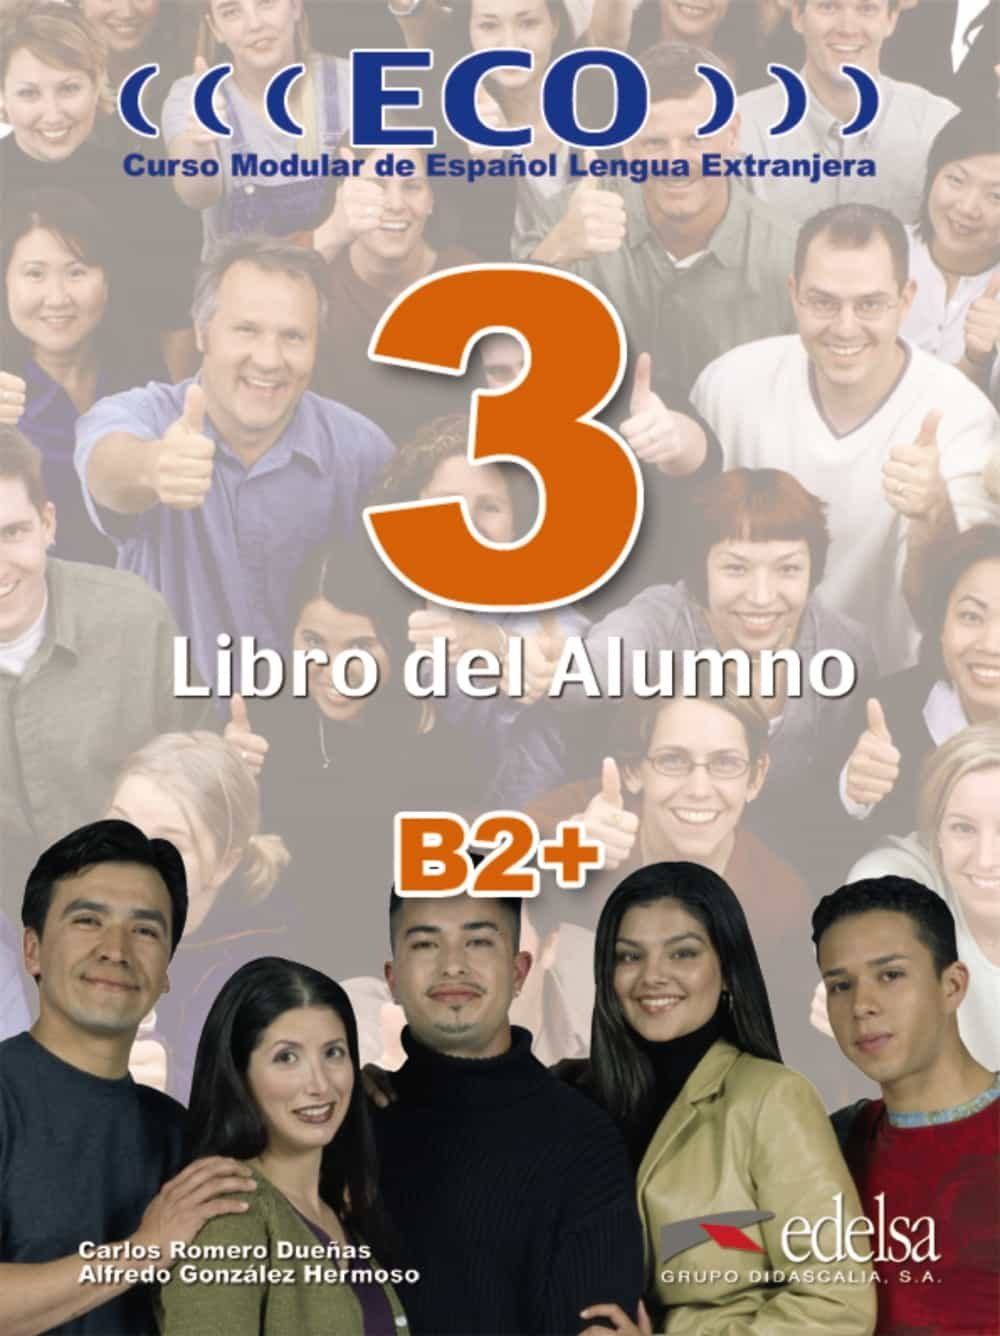 Eco 3 Libro Del Alumno: Curso Modular De Español Lengua Extranjer A por Carlos Romero Dueñas;                                                                                    Alfredo Gonzalez Hermoso Gratis